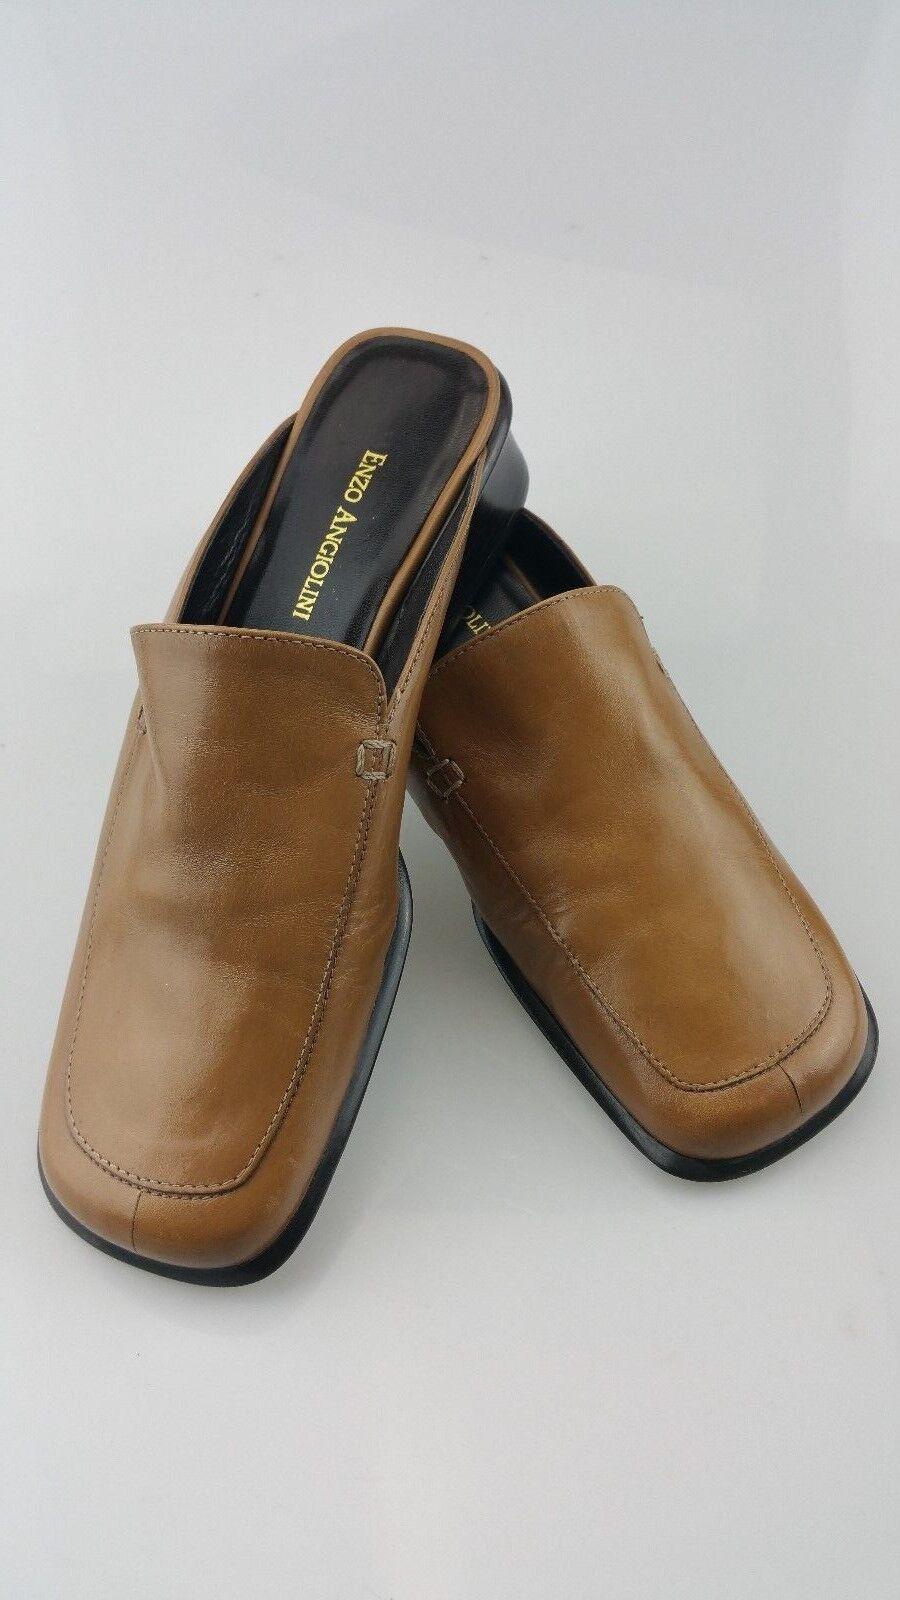 Enzo Angiolini Rondo Tan Leather Square Toe Mules Slide Womens Size 6-1 2 Medium